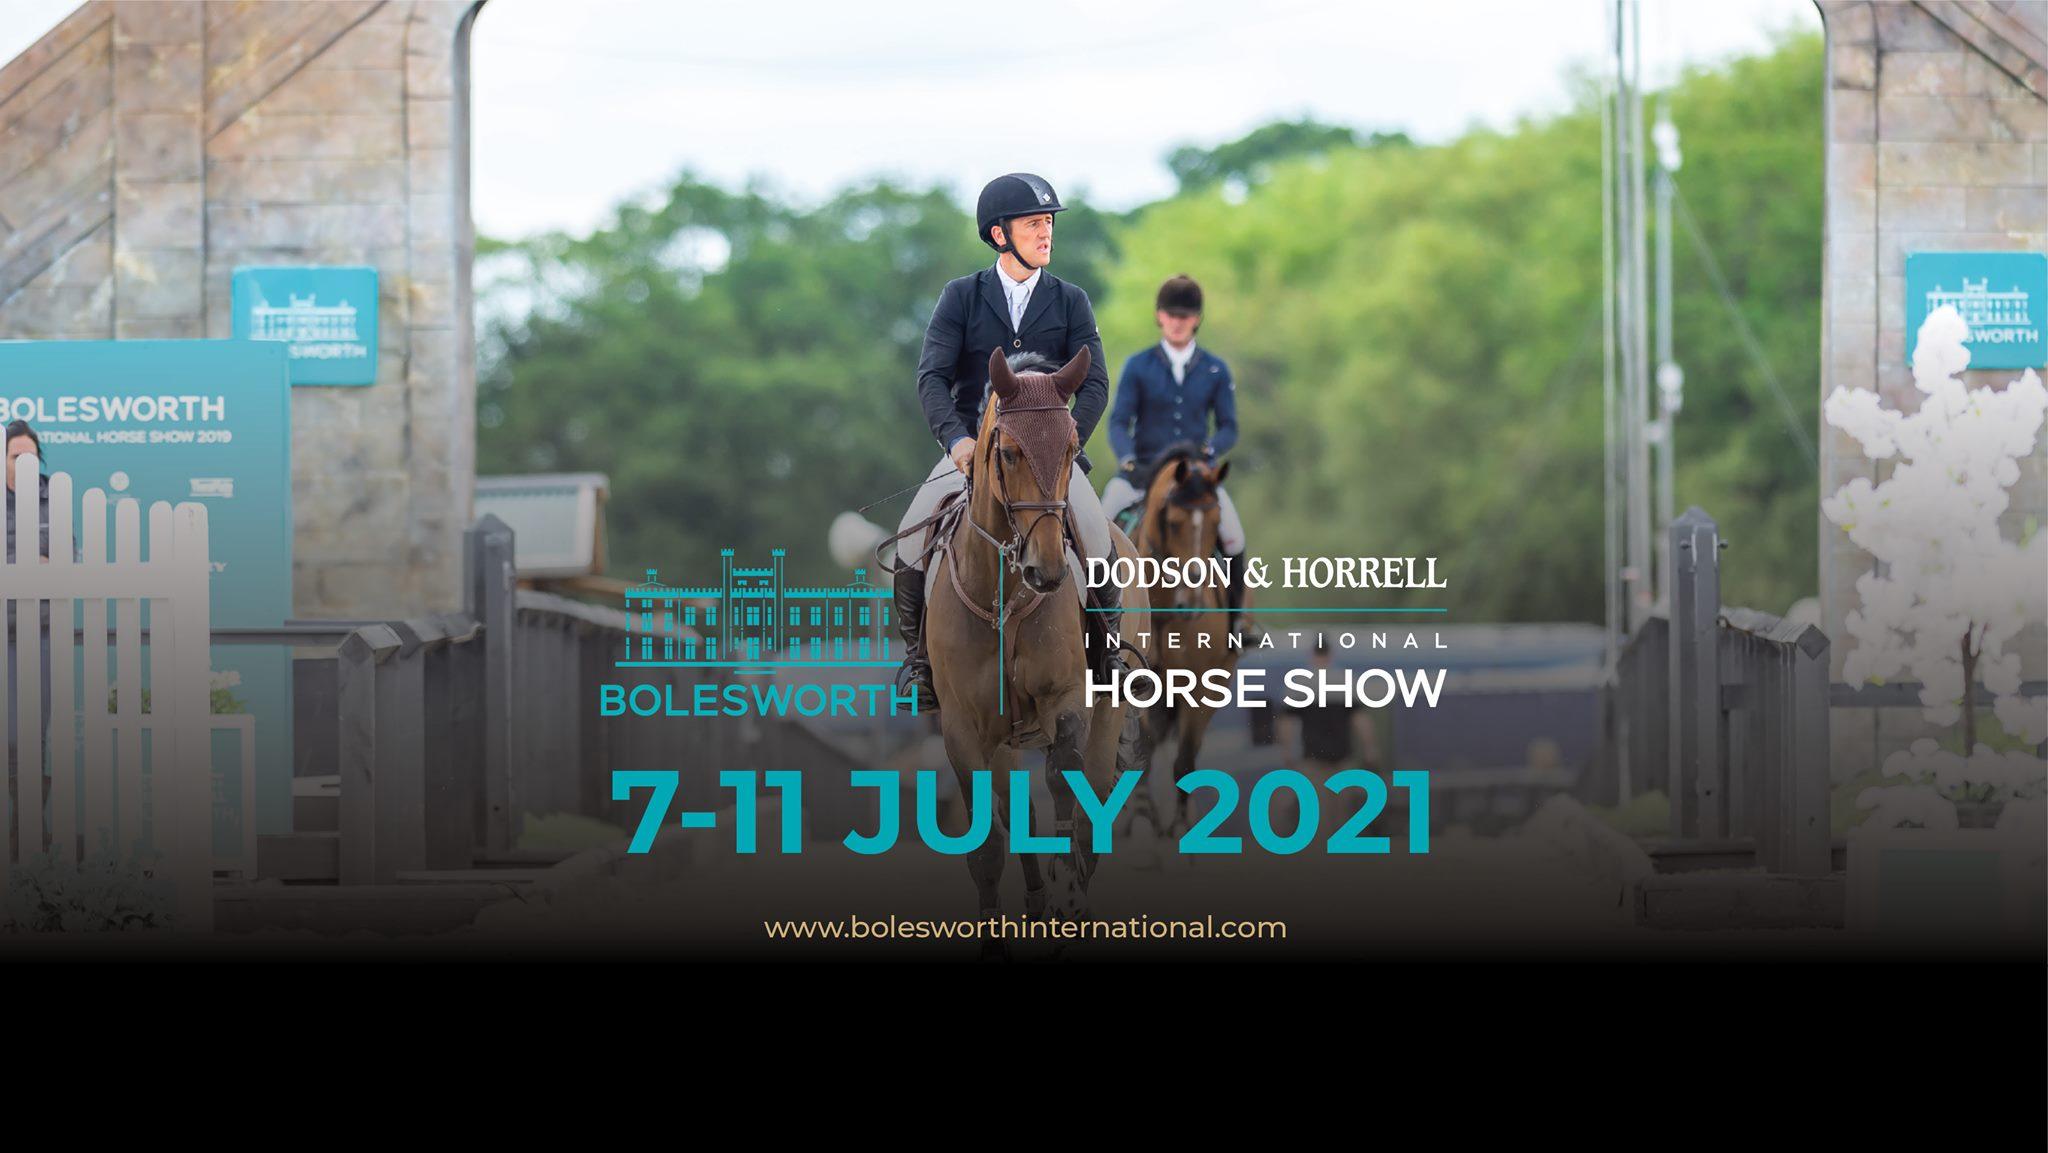 The Dodson & Horrell Bolesworth International 2021